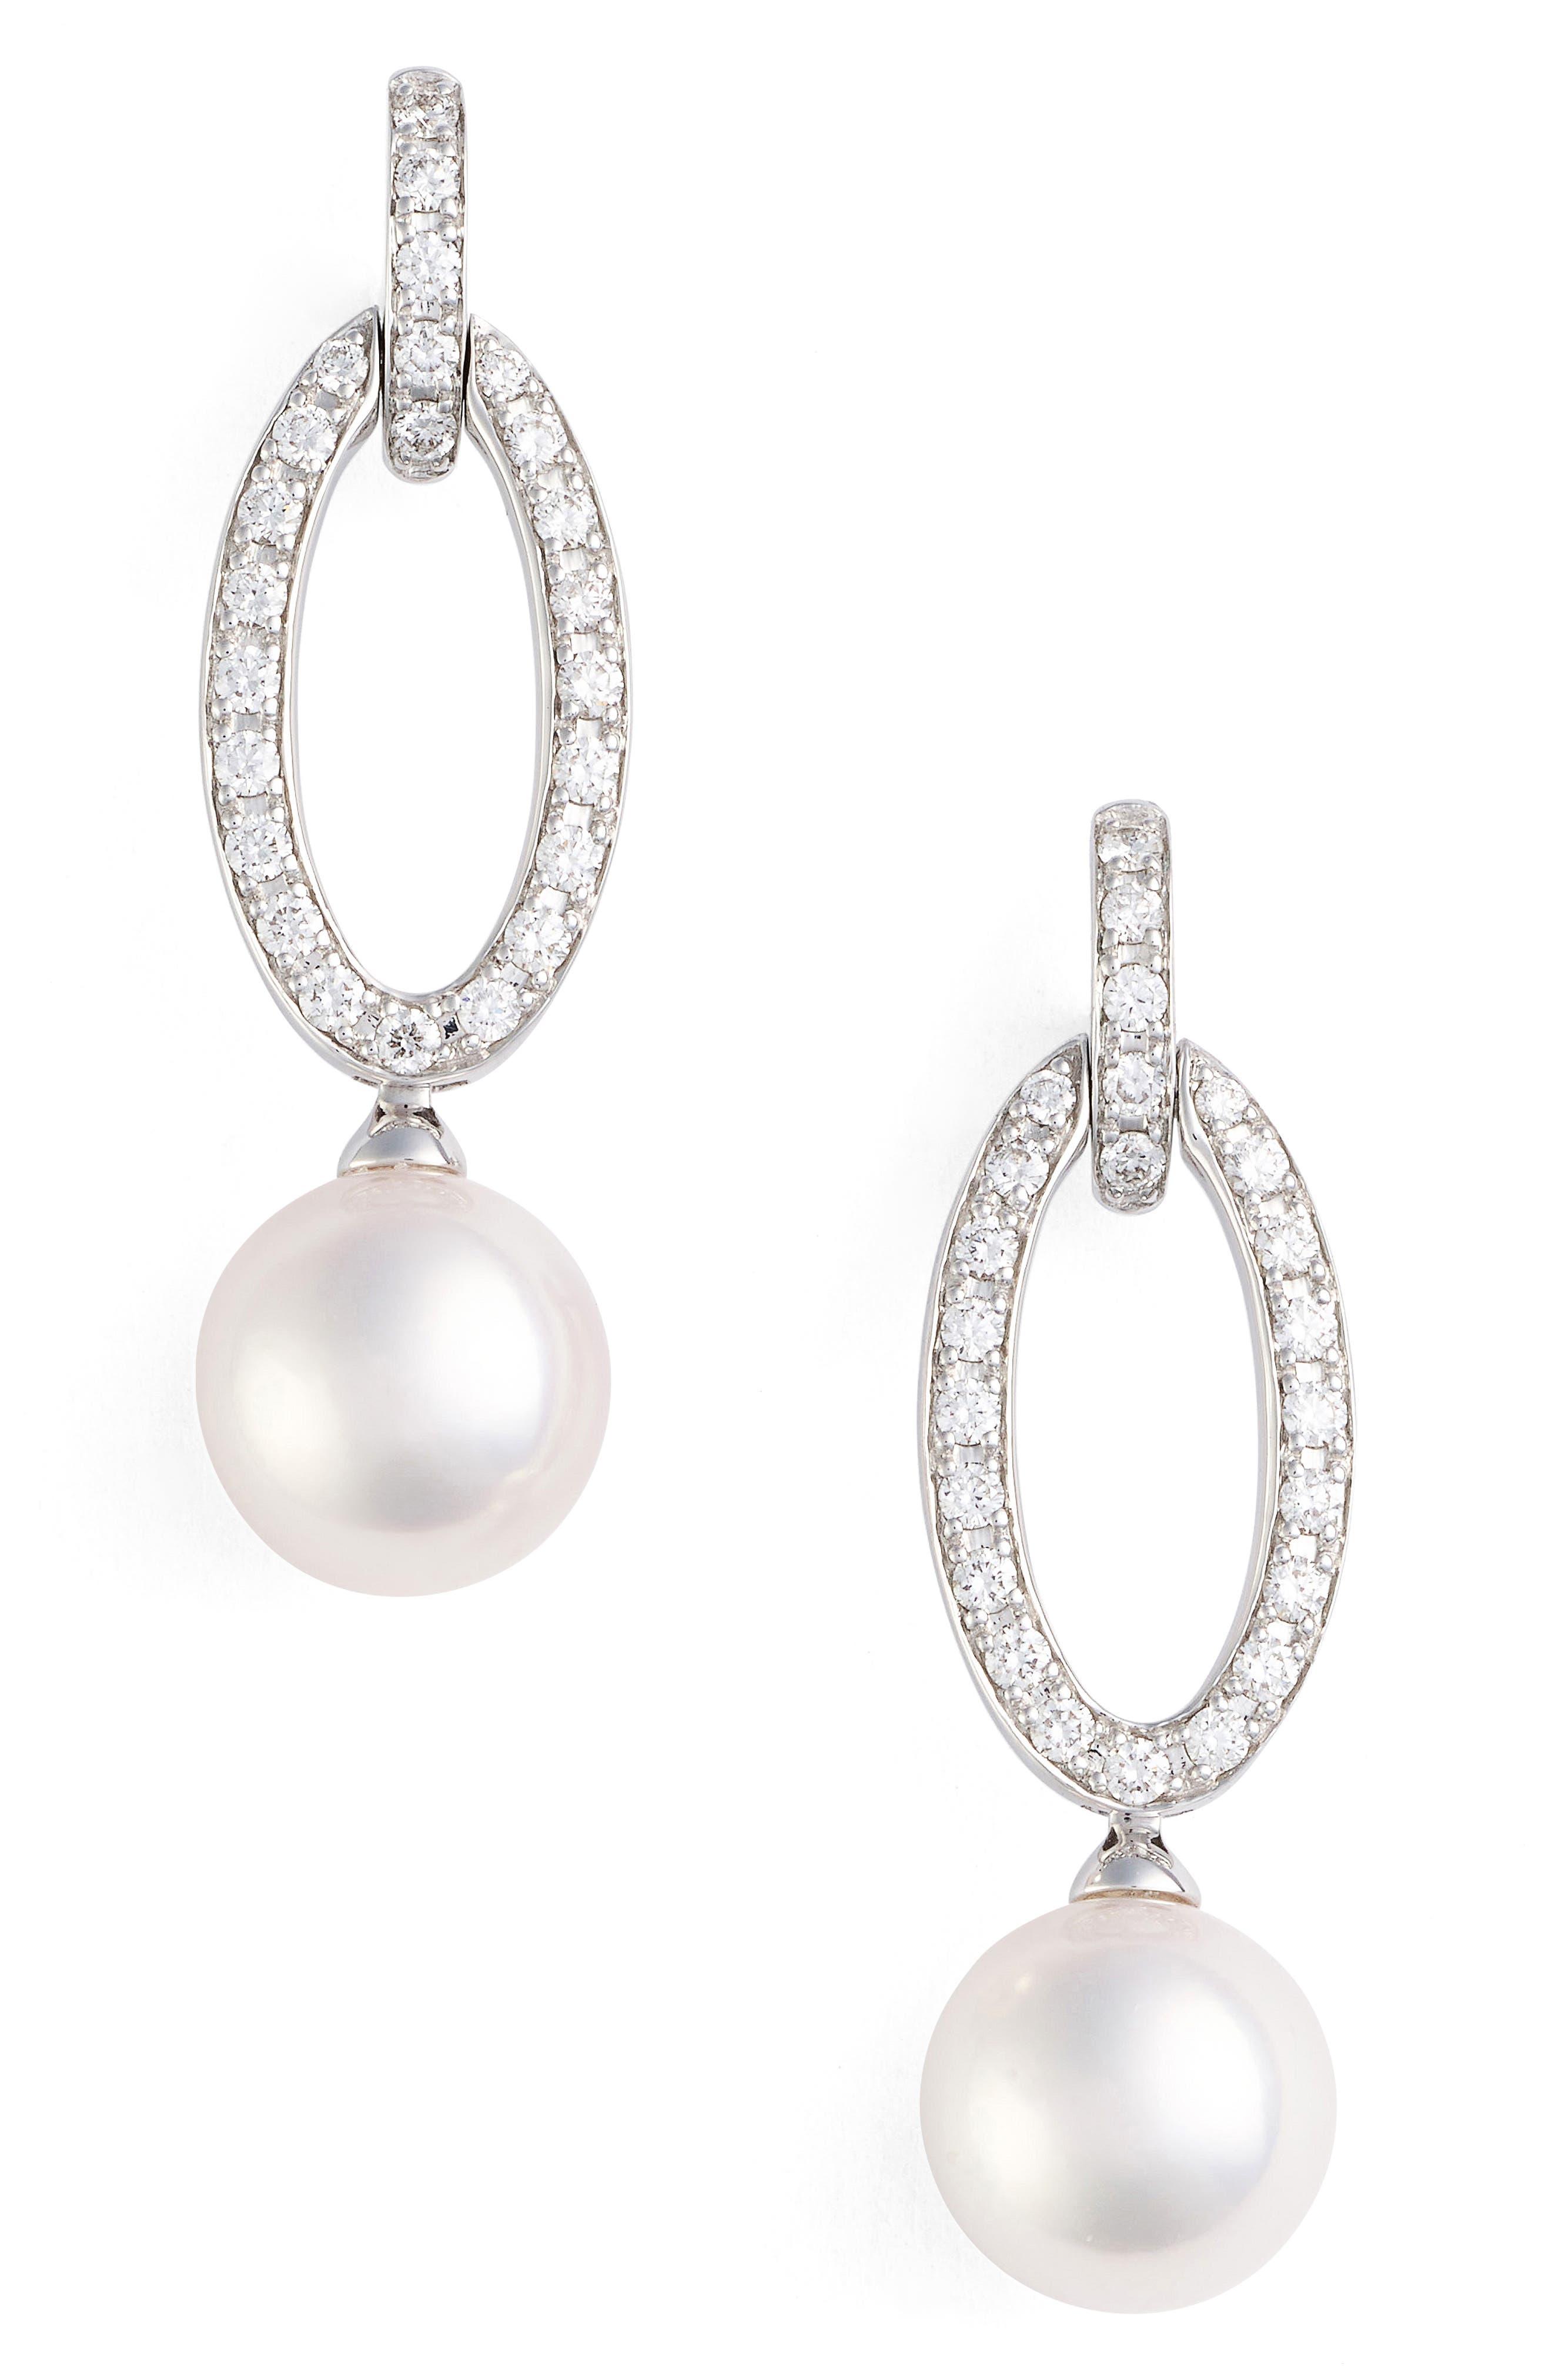 Diamond & Pearl Drop Earrings,                             Main thumbnail 1, color,                             WHITE GOLD